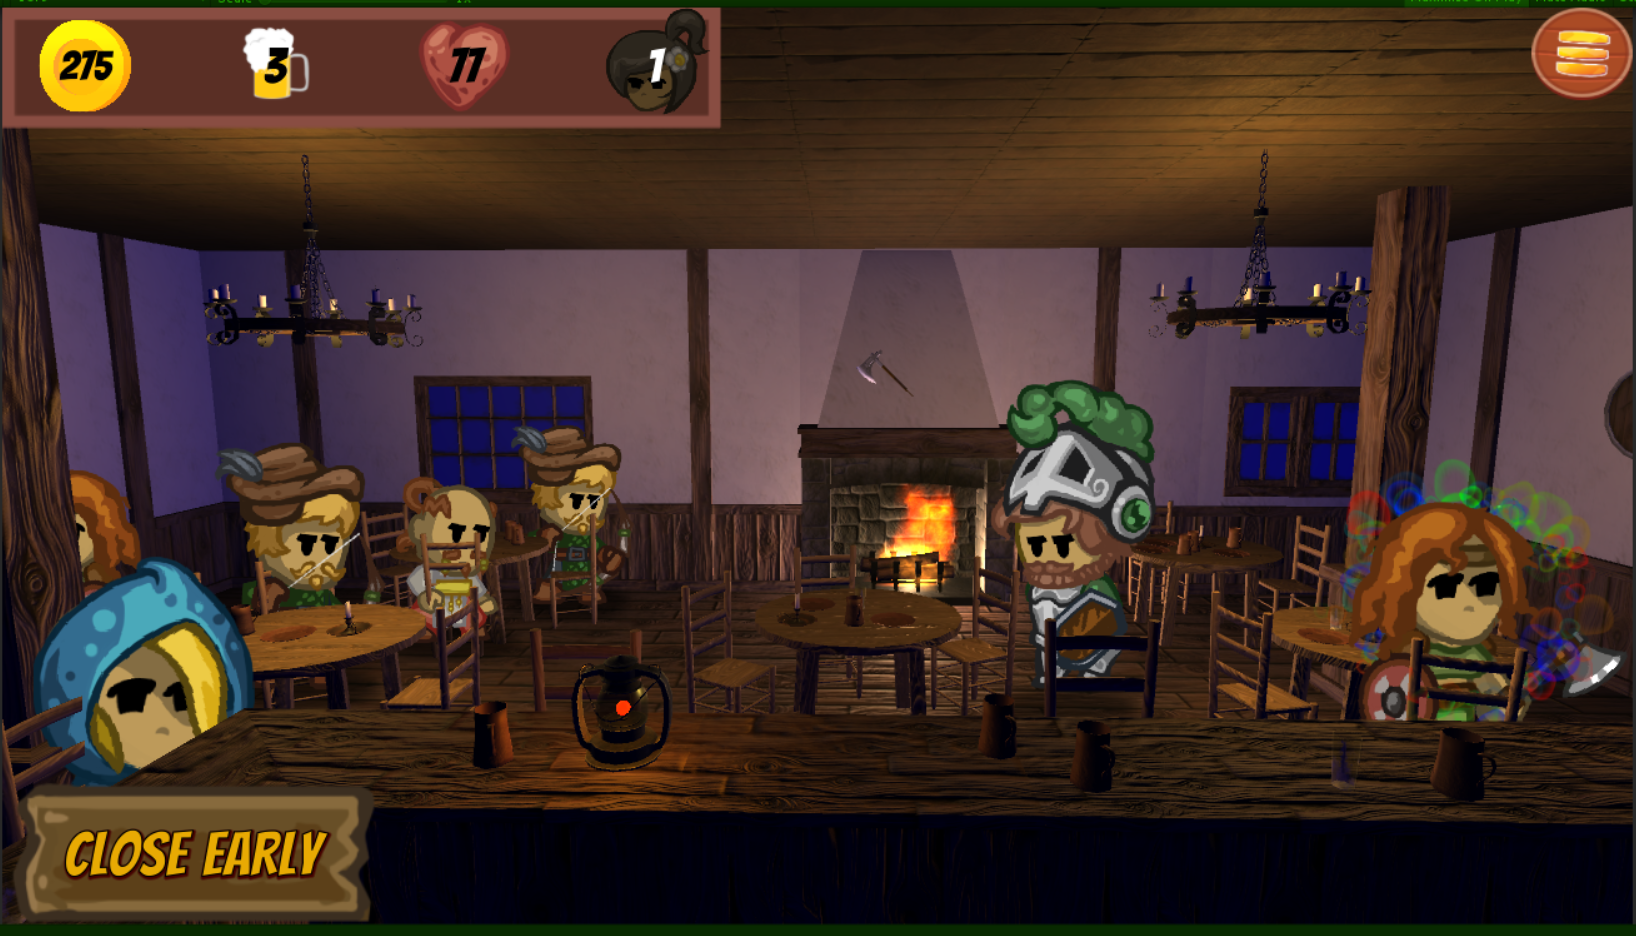 A Tavern Life